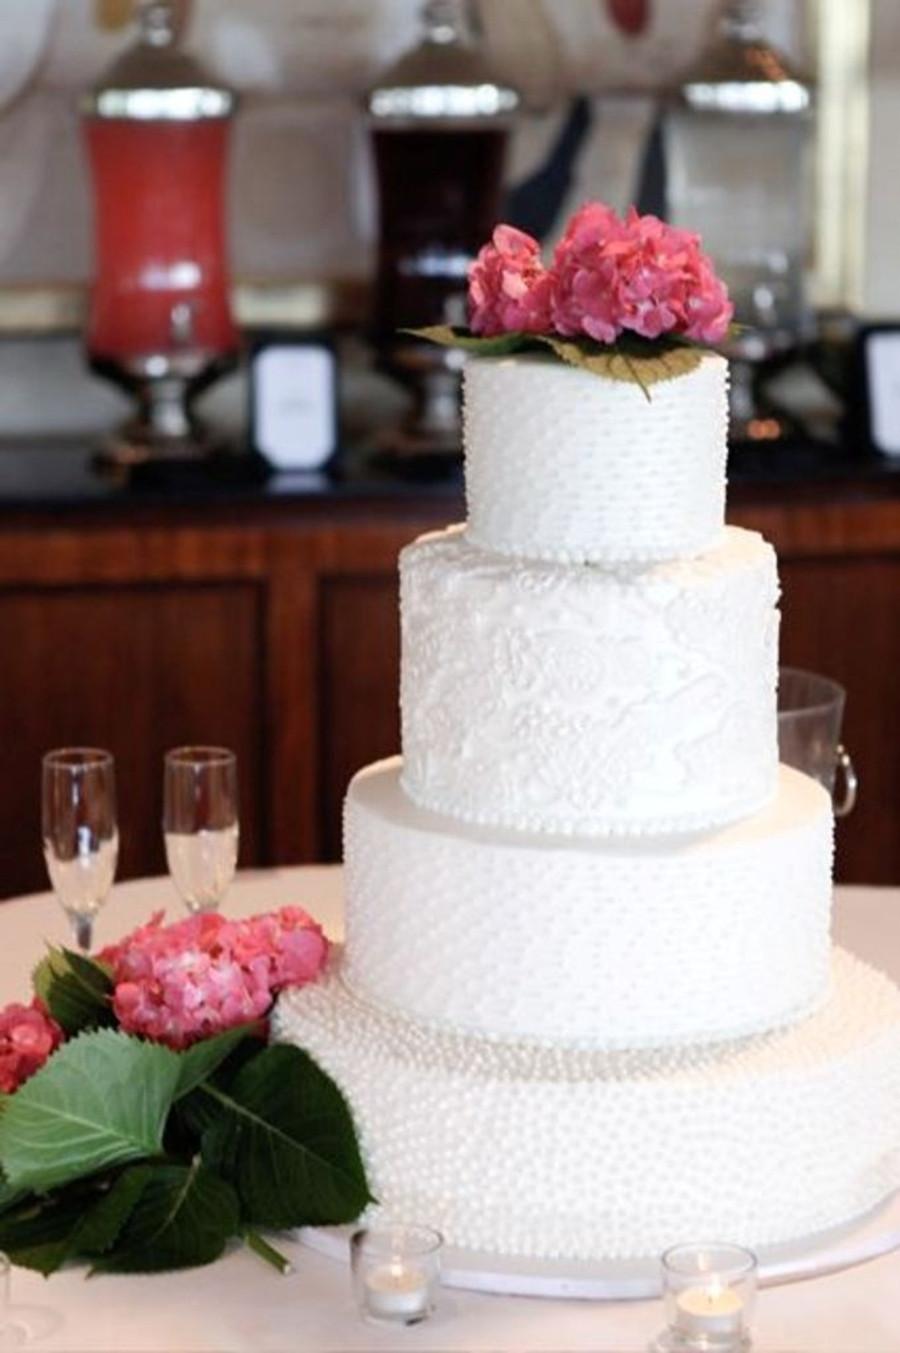 Buttercream Wedding Cakes  4 Tier Buttercream Wedding Cake CakeCentral